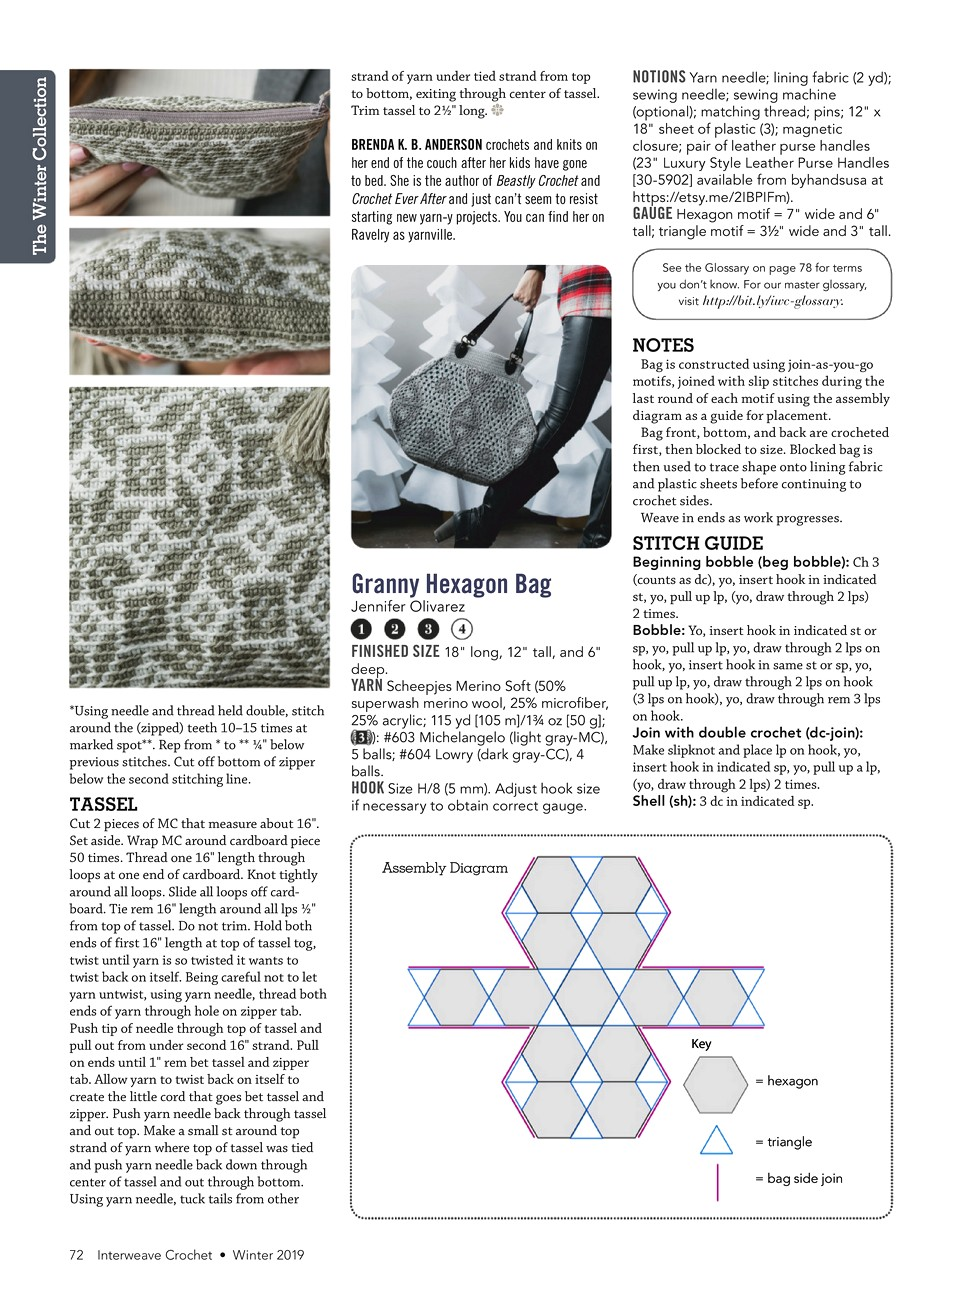 Interweave Crochet Winter 2019-73